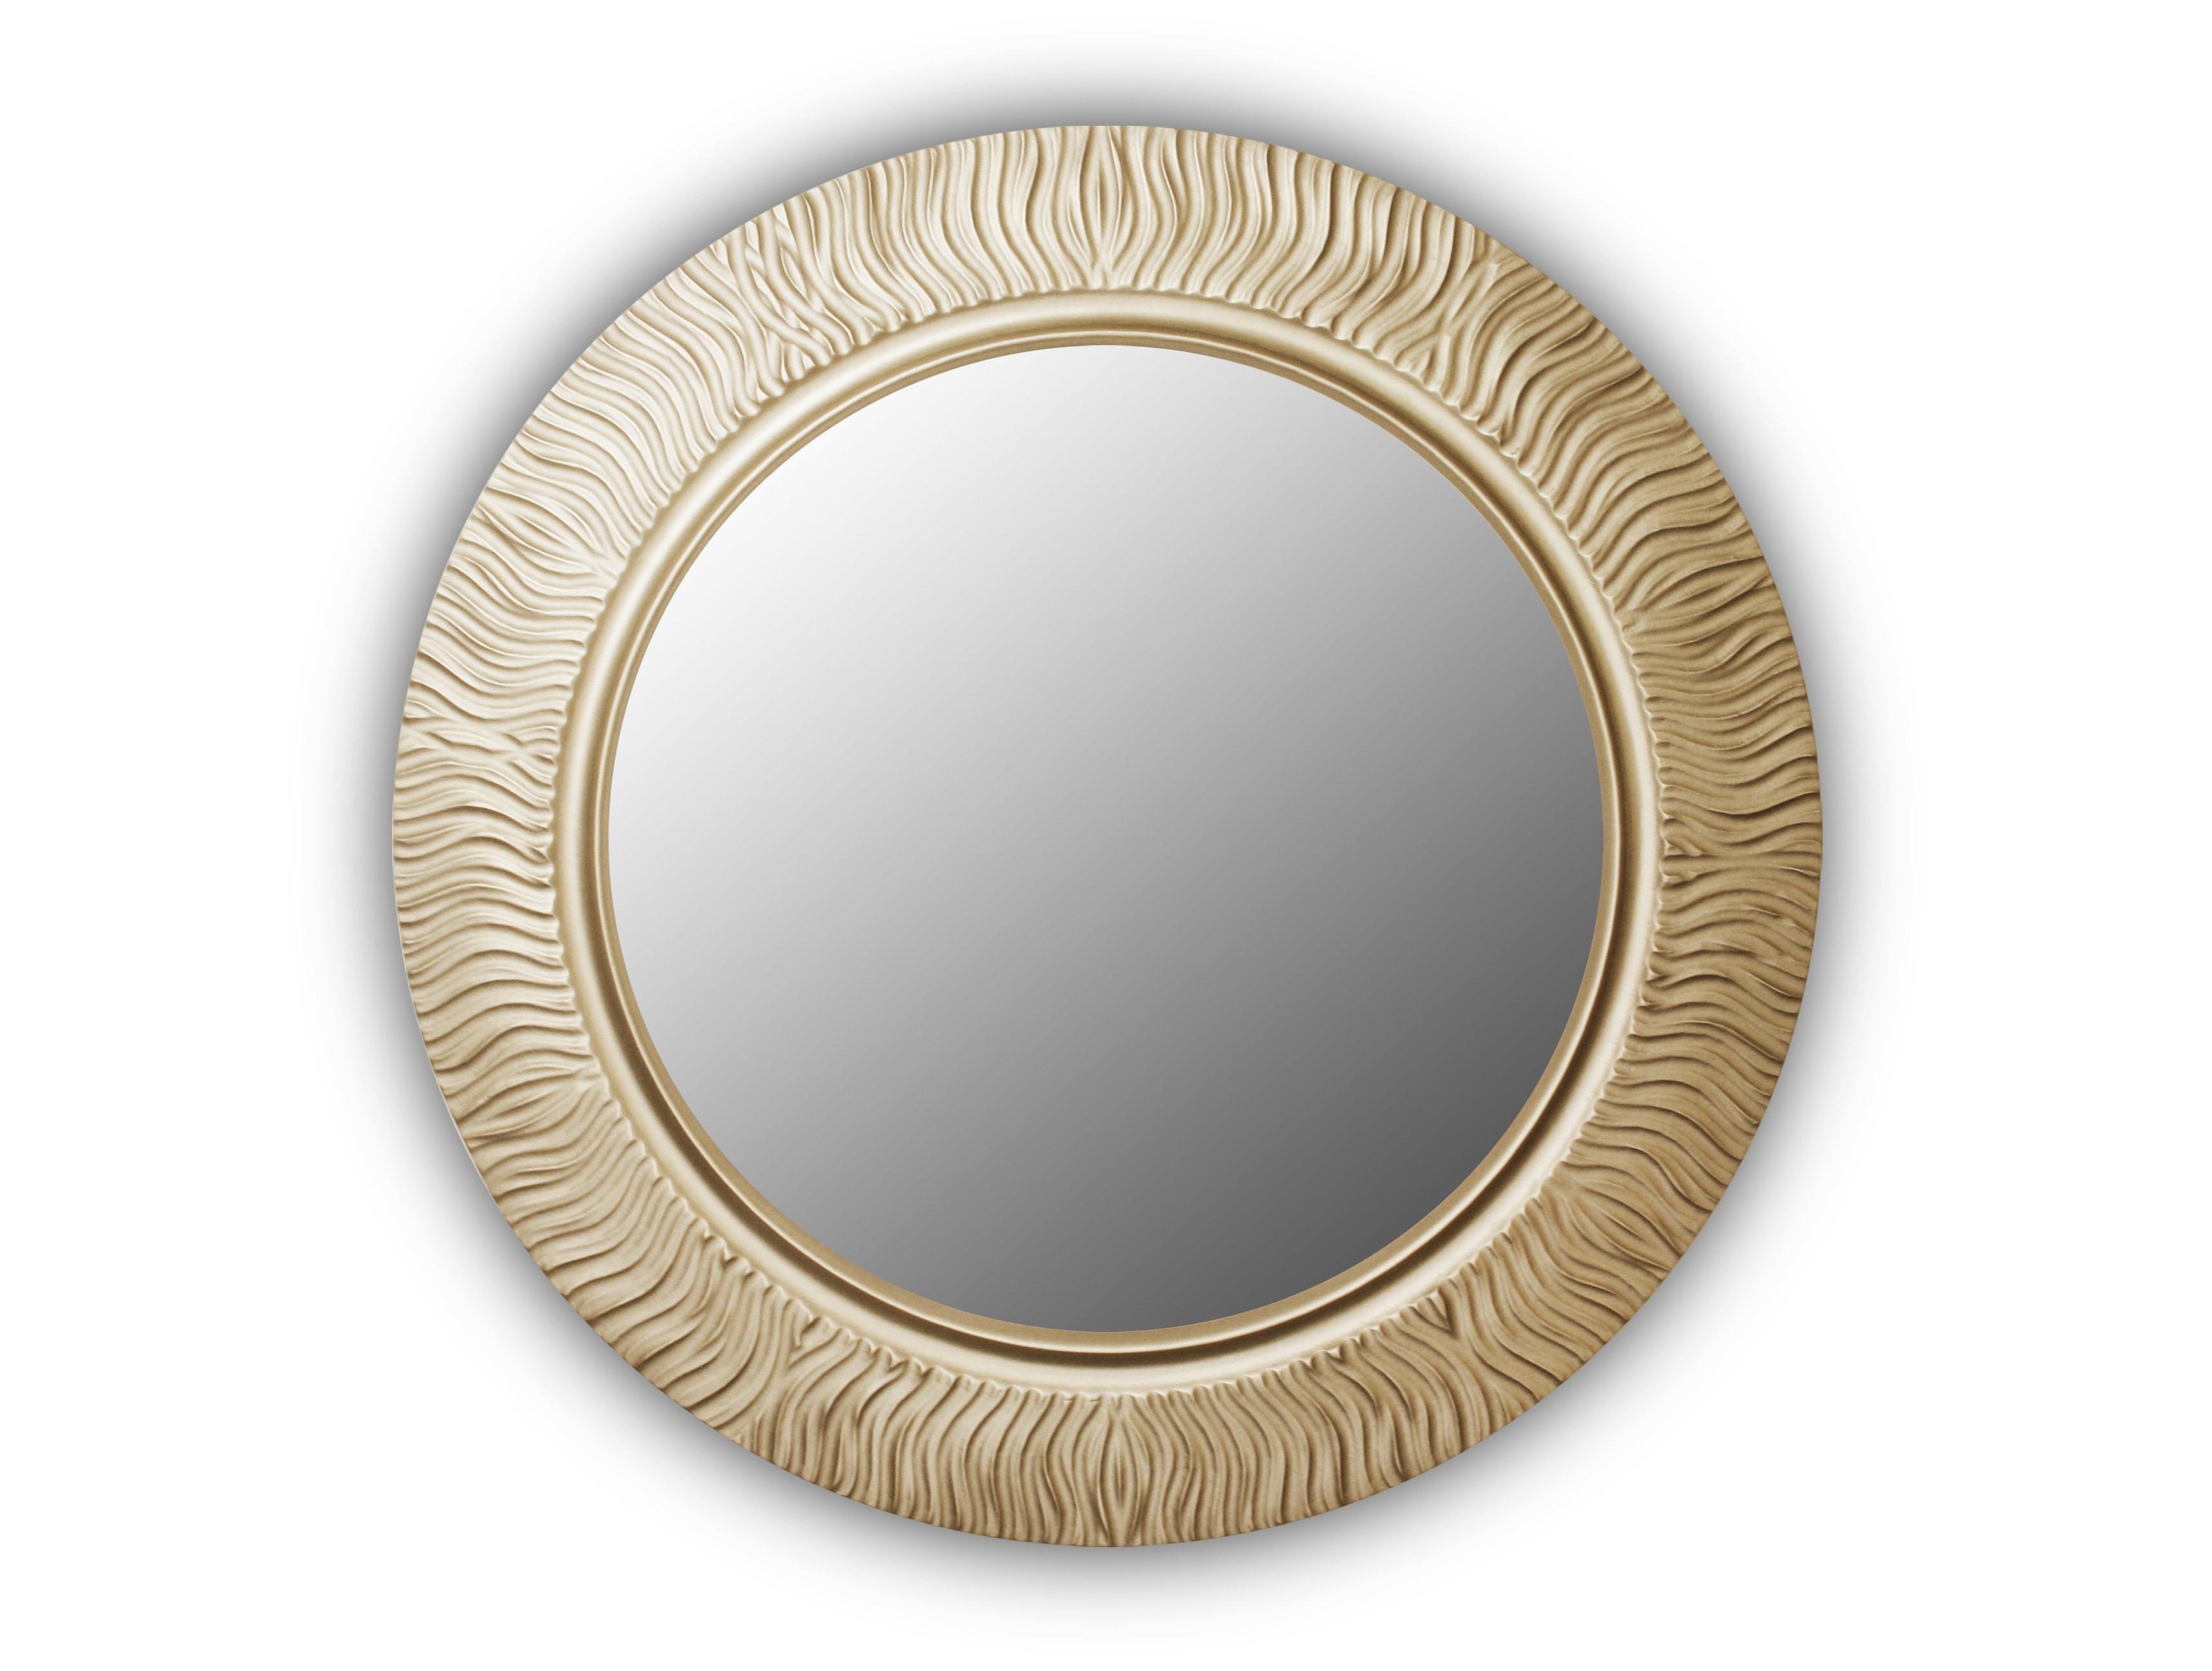 Зеркало Fashion waveНастенные зеркала<br>Патина&amp;amp;nbsp;&amp;lt;div&amp;gt;Возможен заказ изделий размерами 90 см, 75 см, 65 см&amp;lt;/div&amp;gt;<br><br>Material: Дерево<br>Height см: 3.6<br>Diameter см: 90